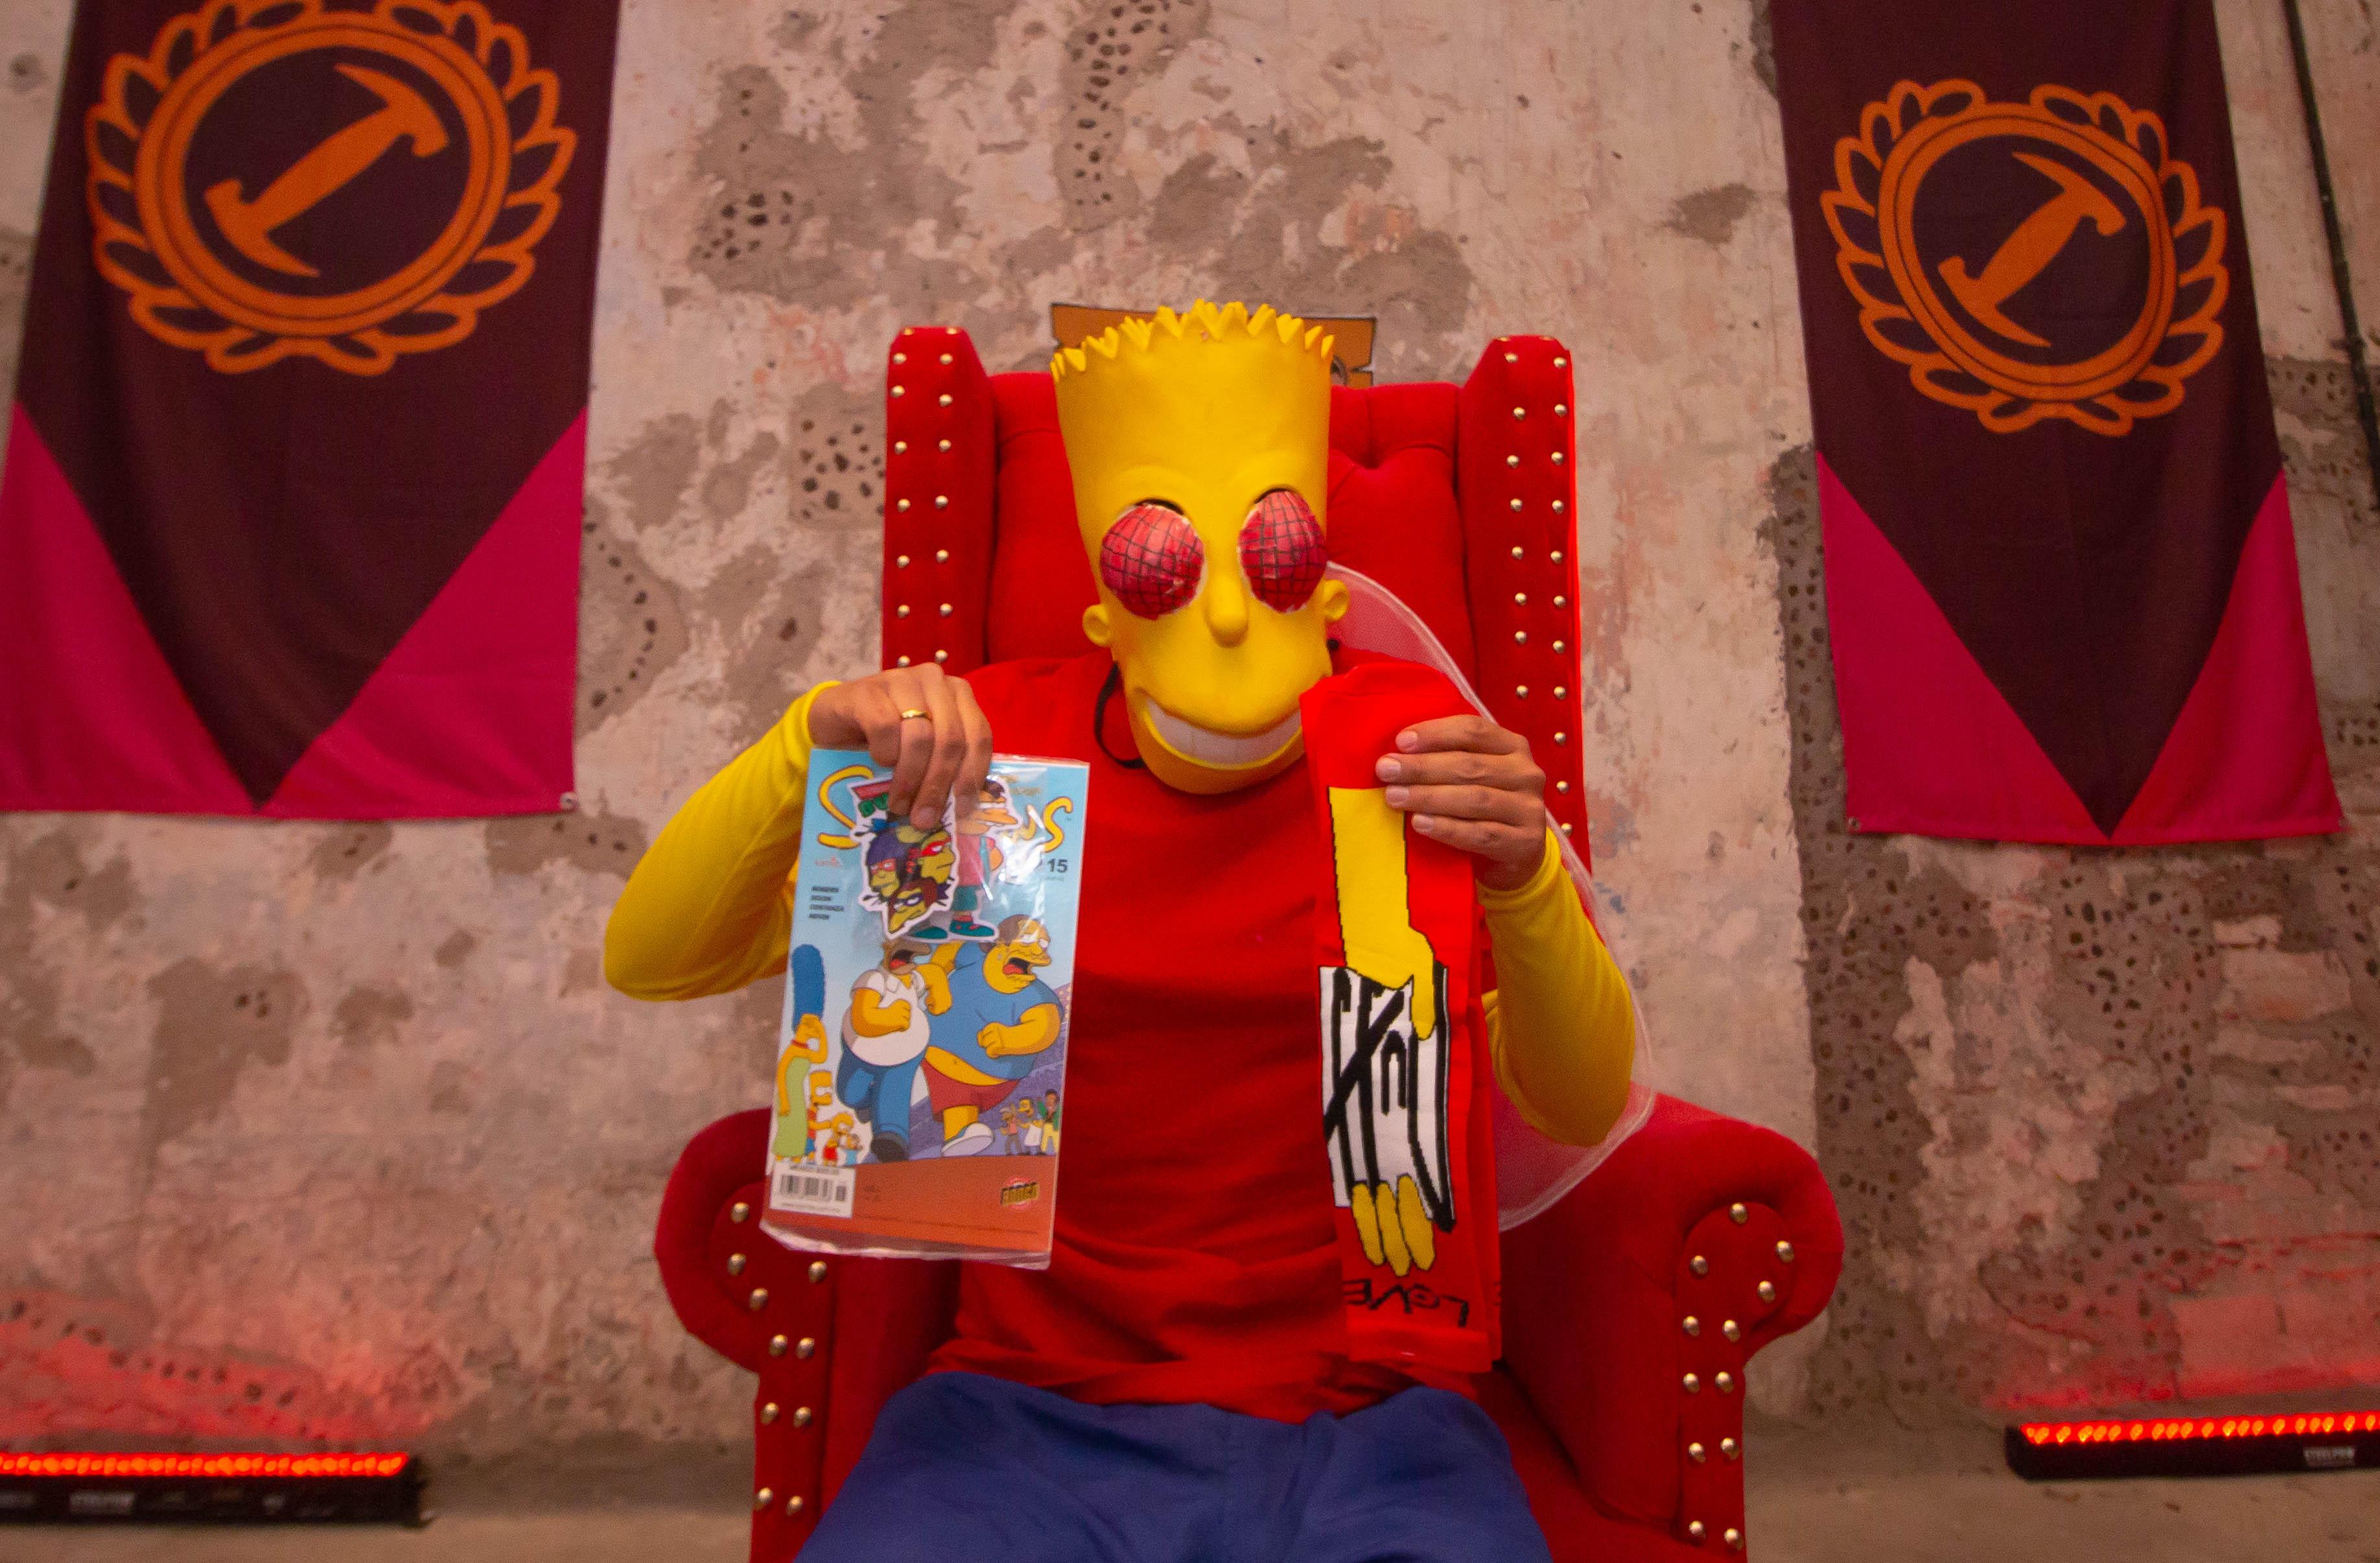 ¡Ay, caramba! Simpson Fest llega con rosquillas y cerveza Duff